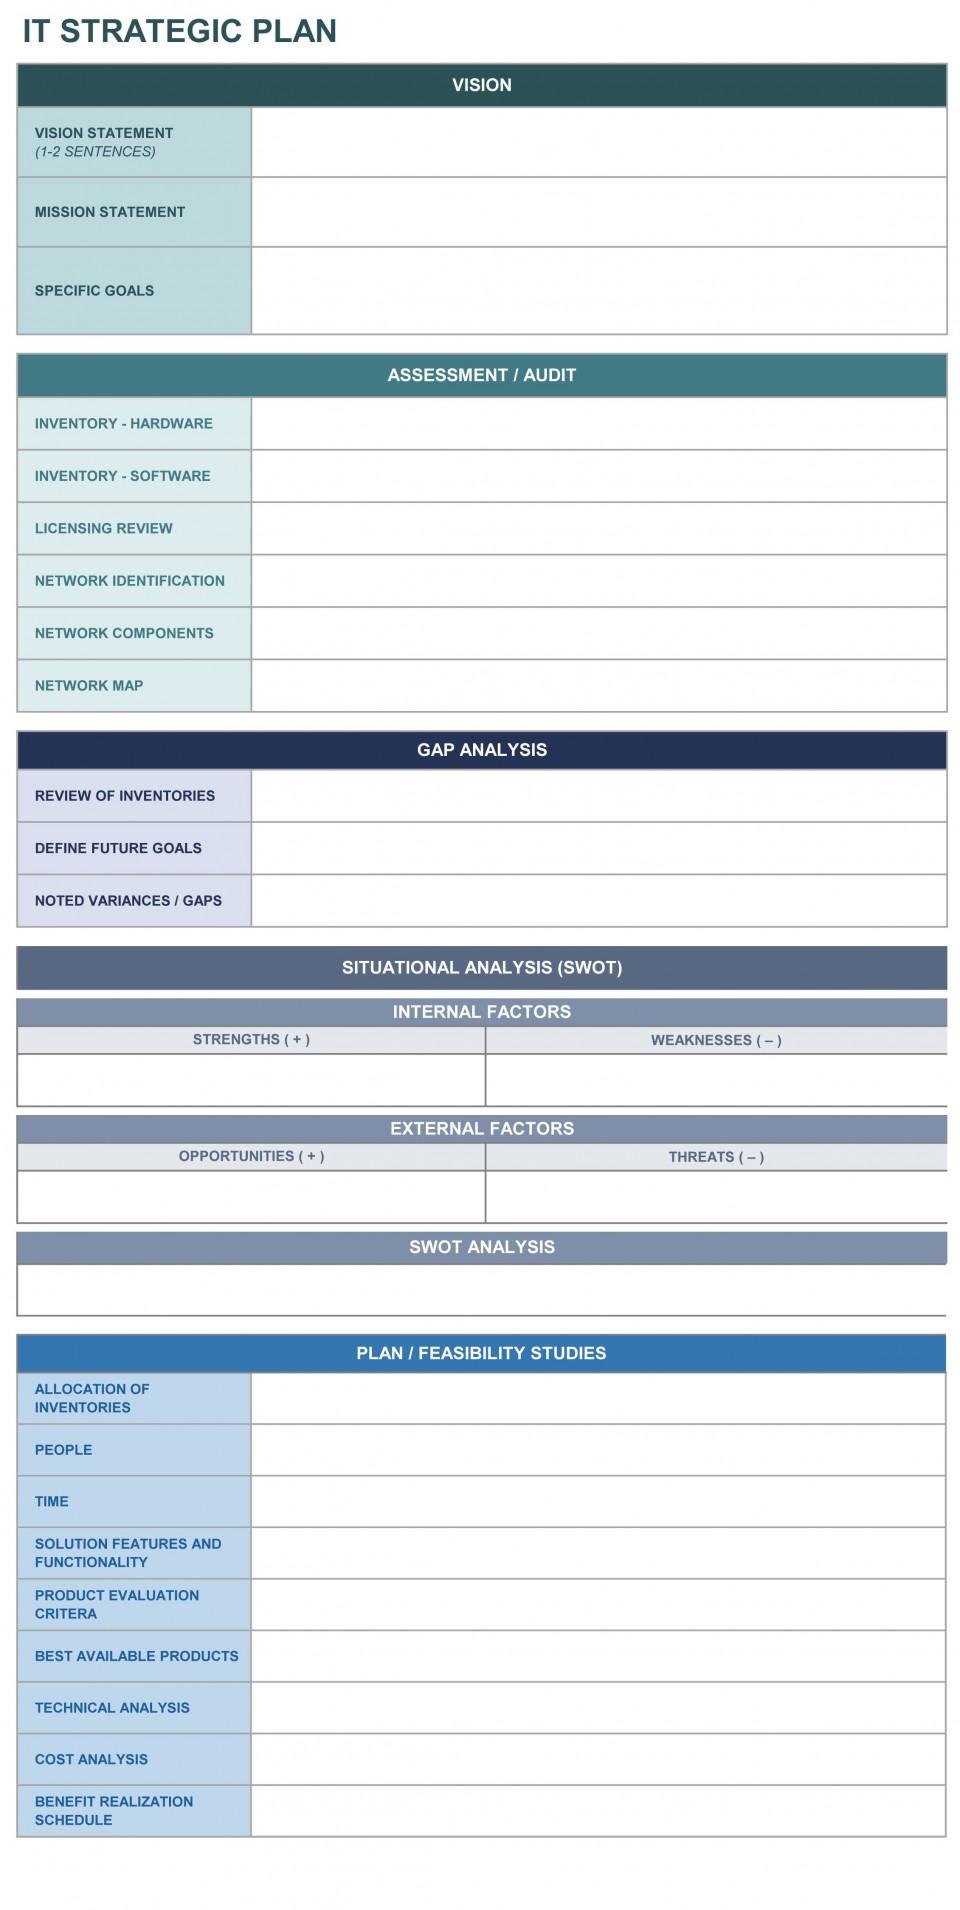 004 Dreaded Strategic Planning Template Excel Free Idea 960